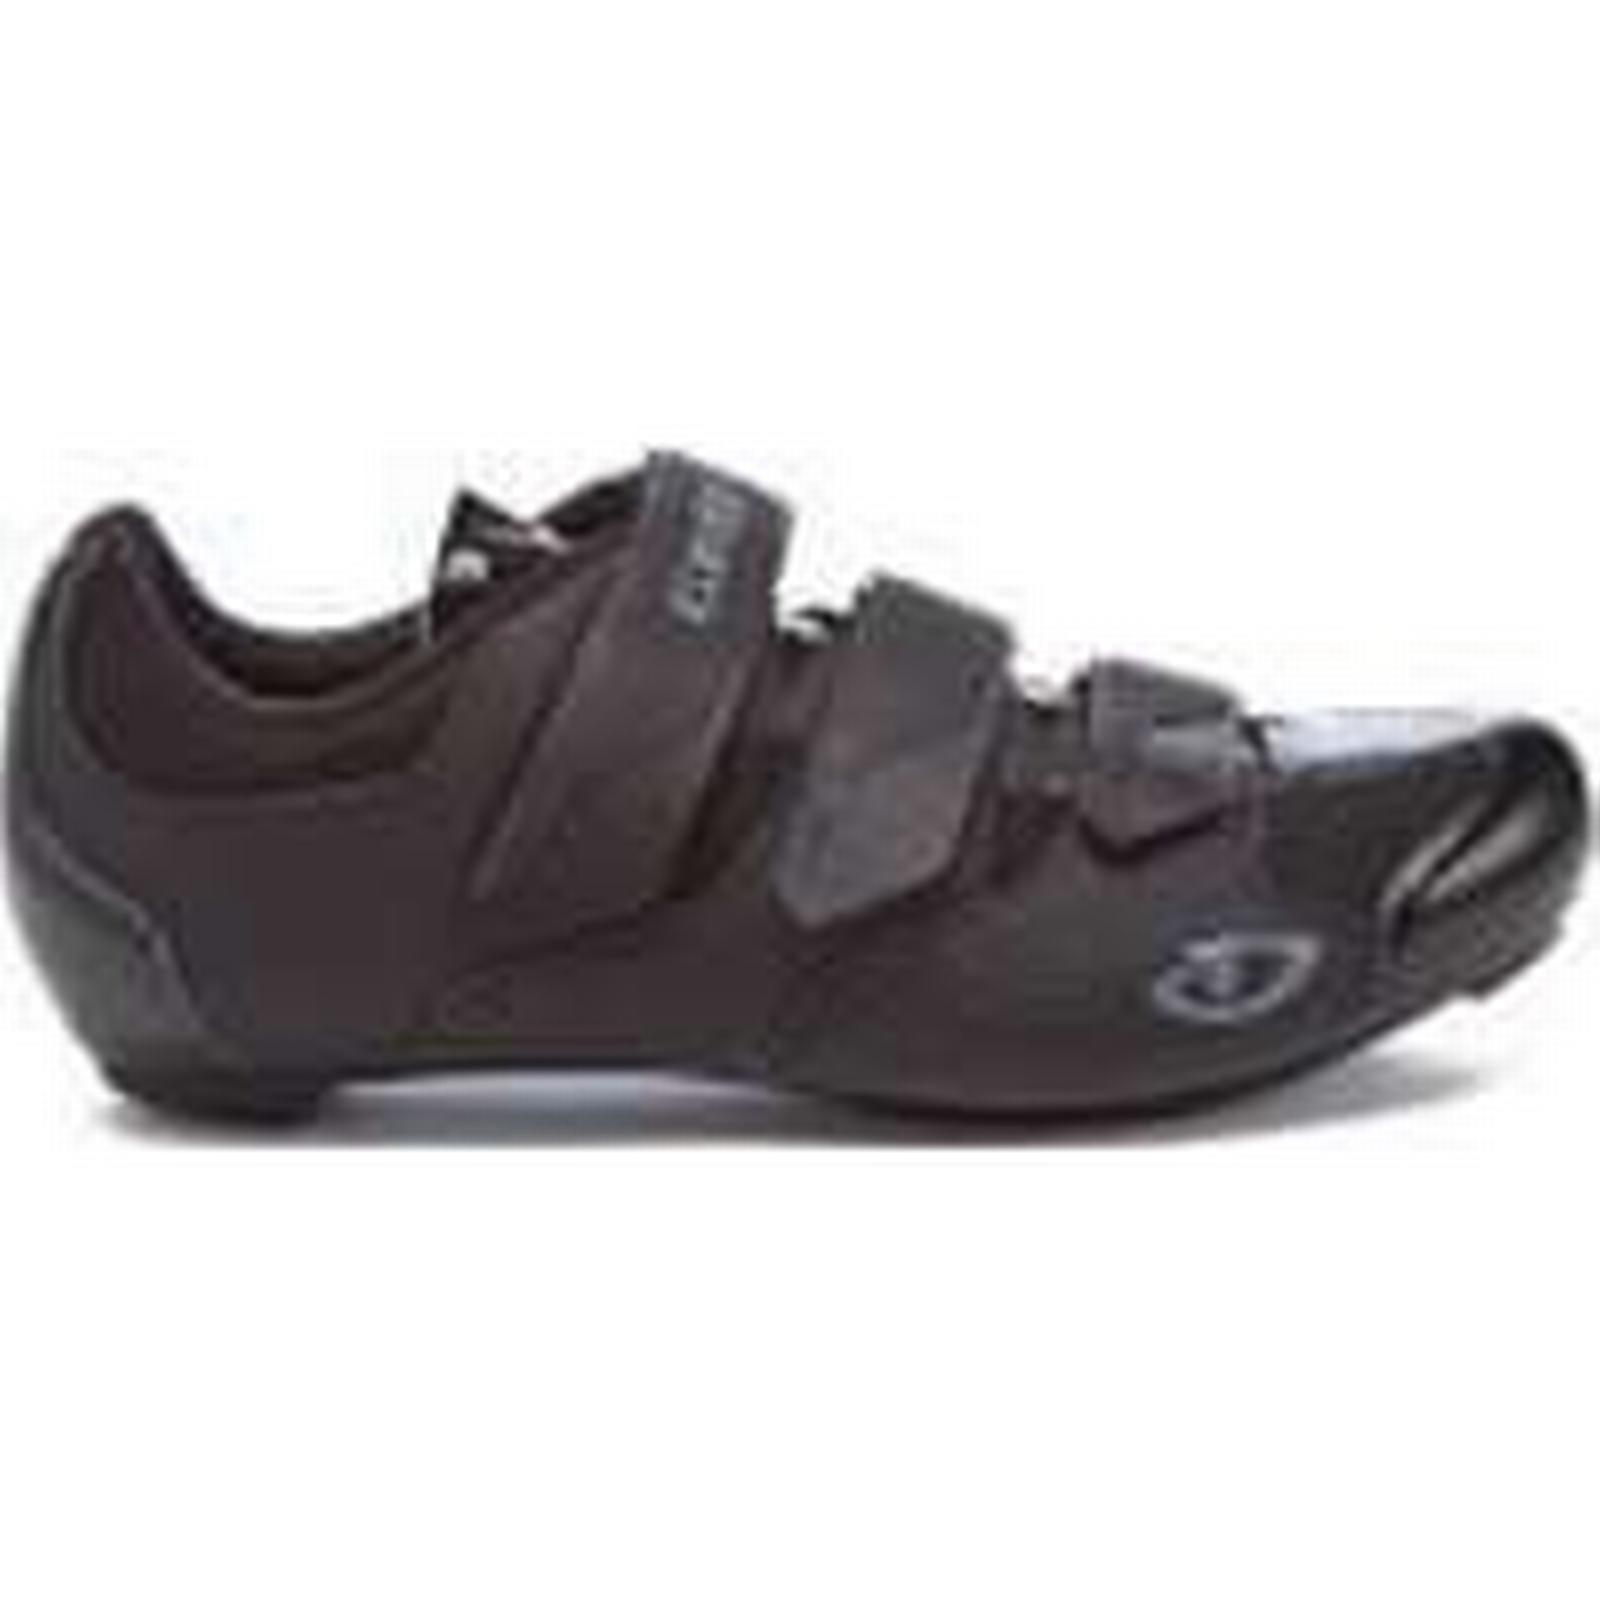 Giro Techne Black Road Cycling Shoes - Black Techne - EU 40/UK 6 - Black a642f6